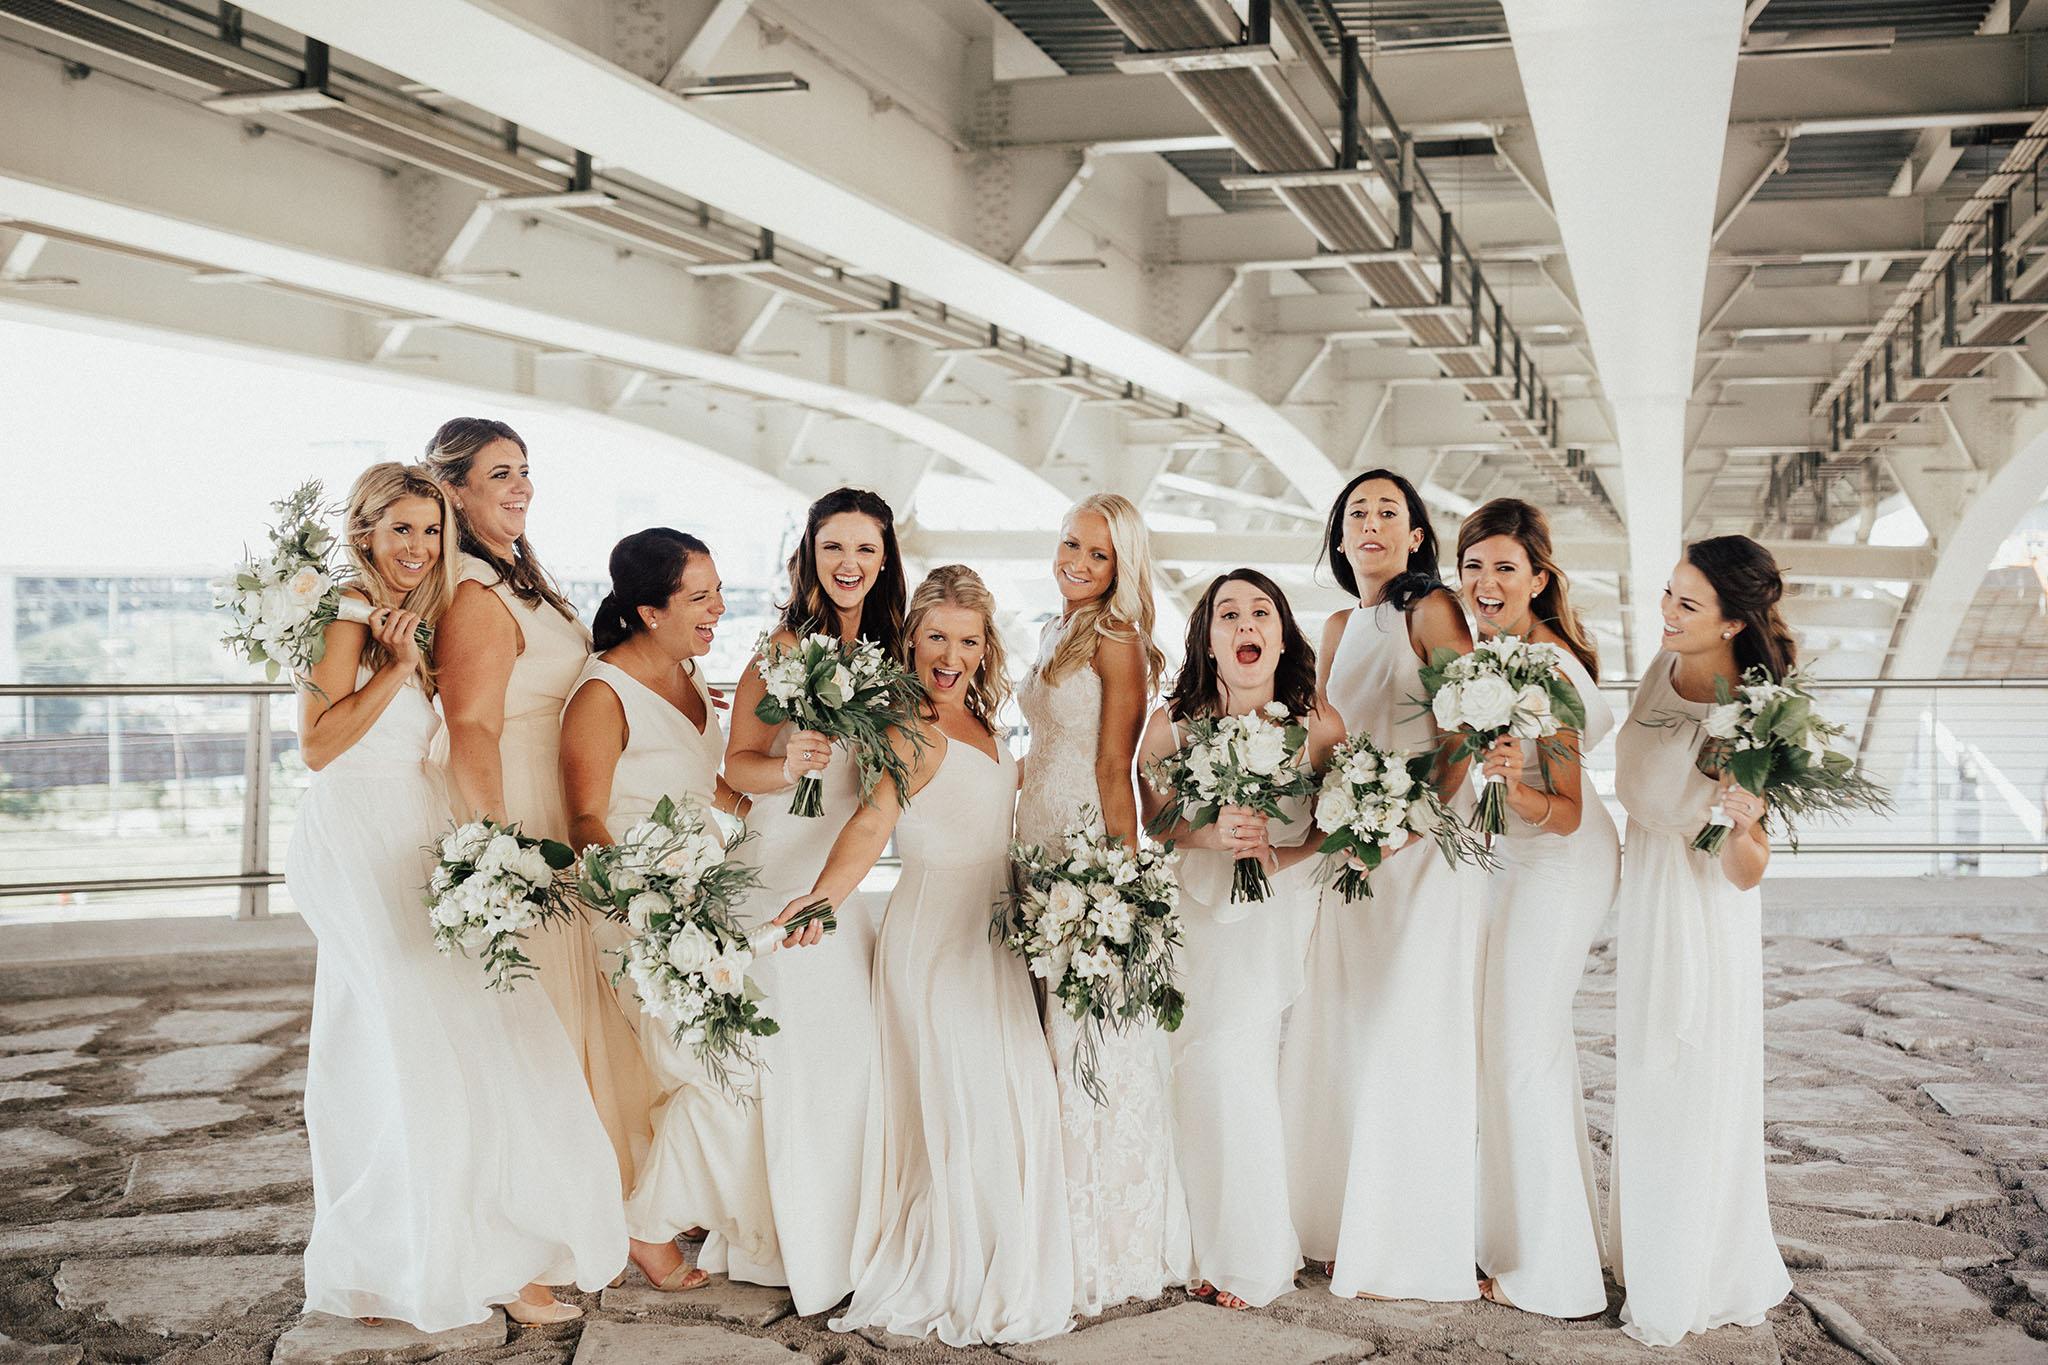 Artistic-Arizona-Wedding-Photographer (45).jpg